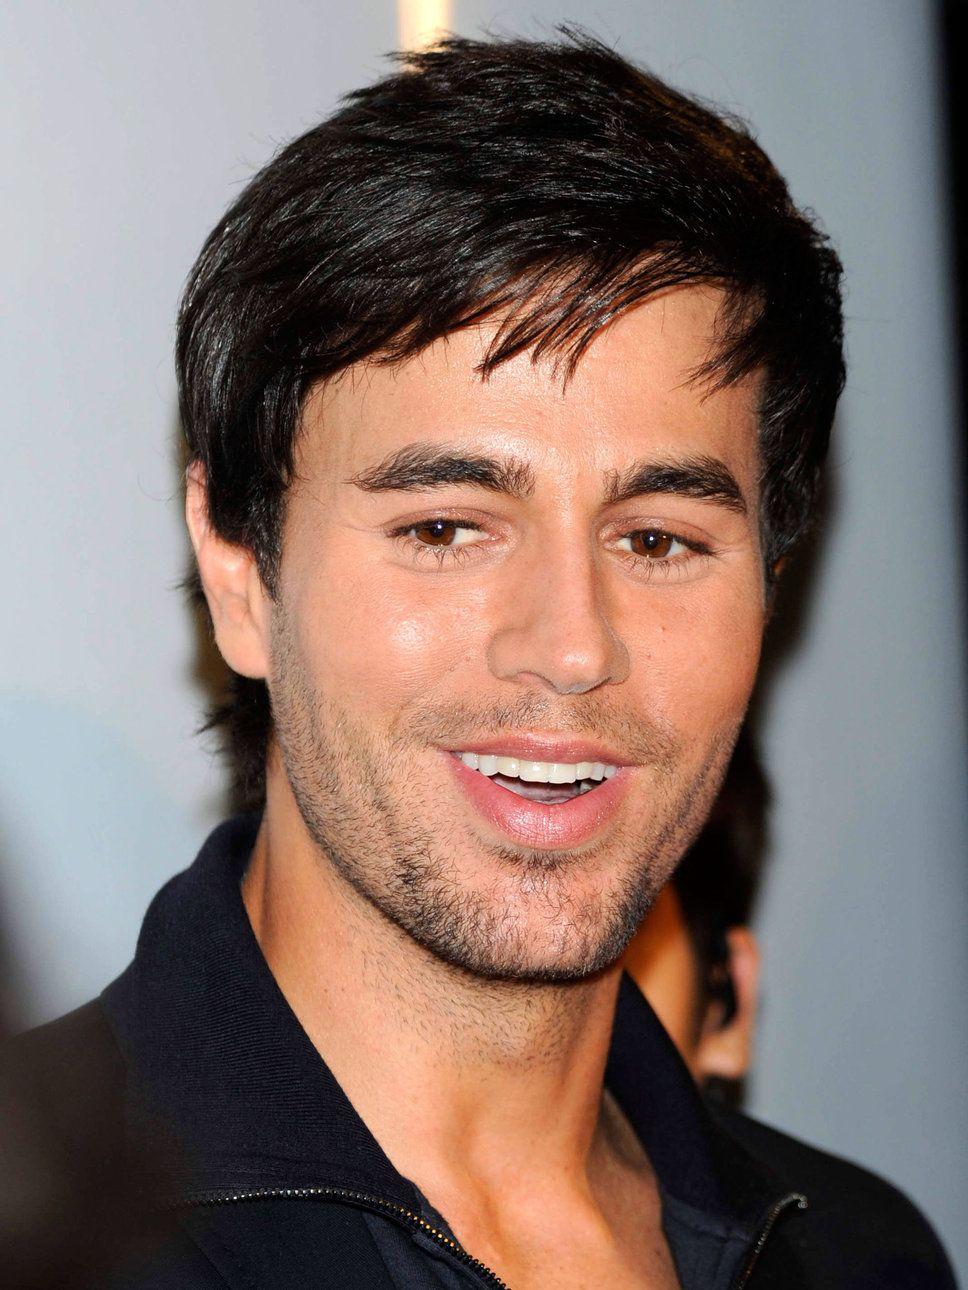 Hollywod Days Enrique Iglesias Short Hairstyles Mens Hairstyles Hairstyles With Bangs Cool Hairstyles For Men